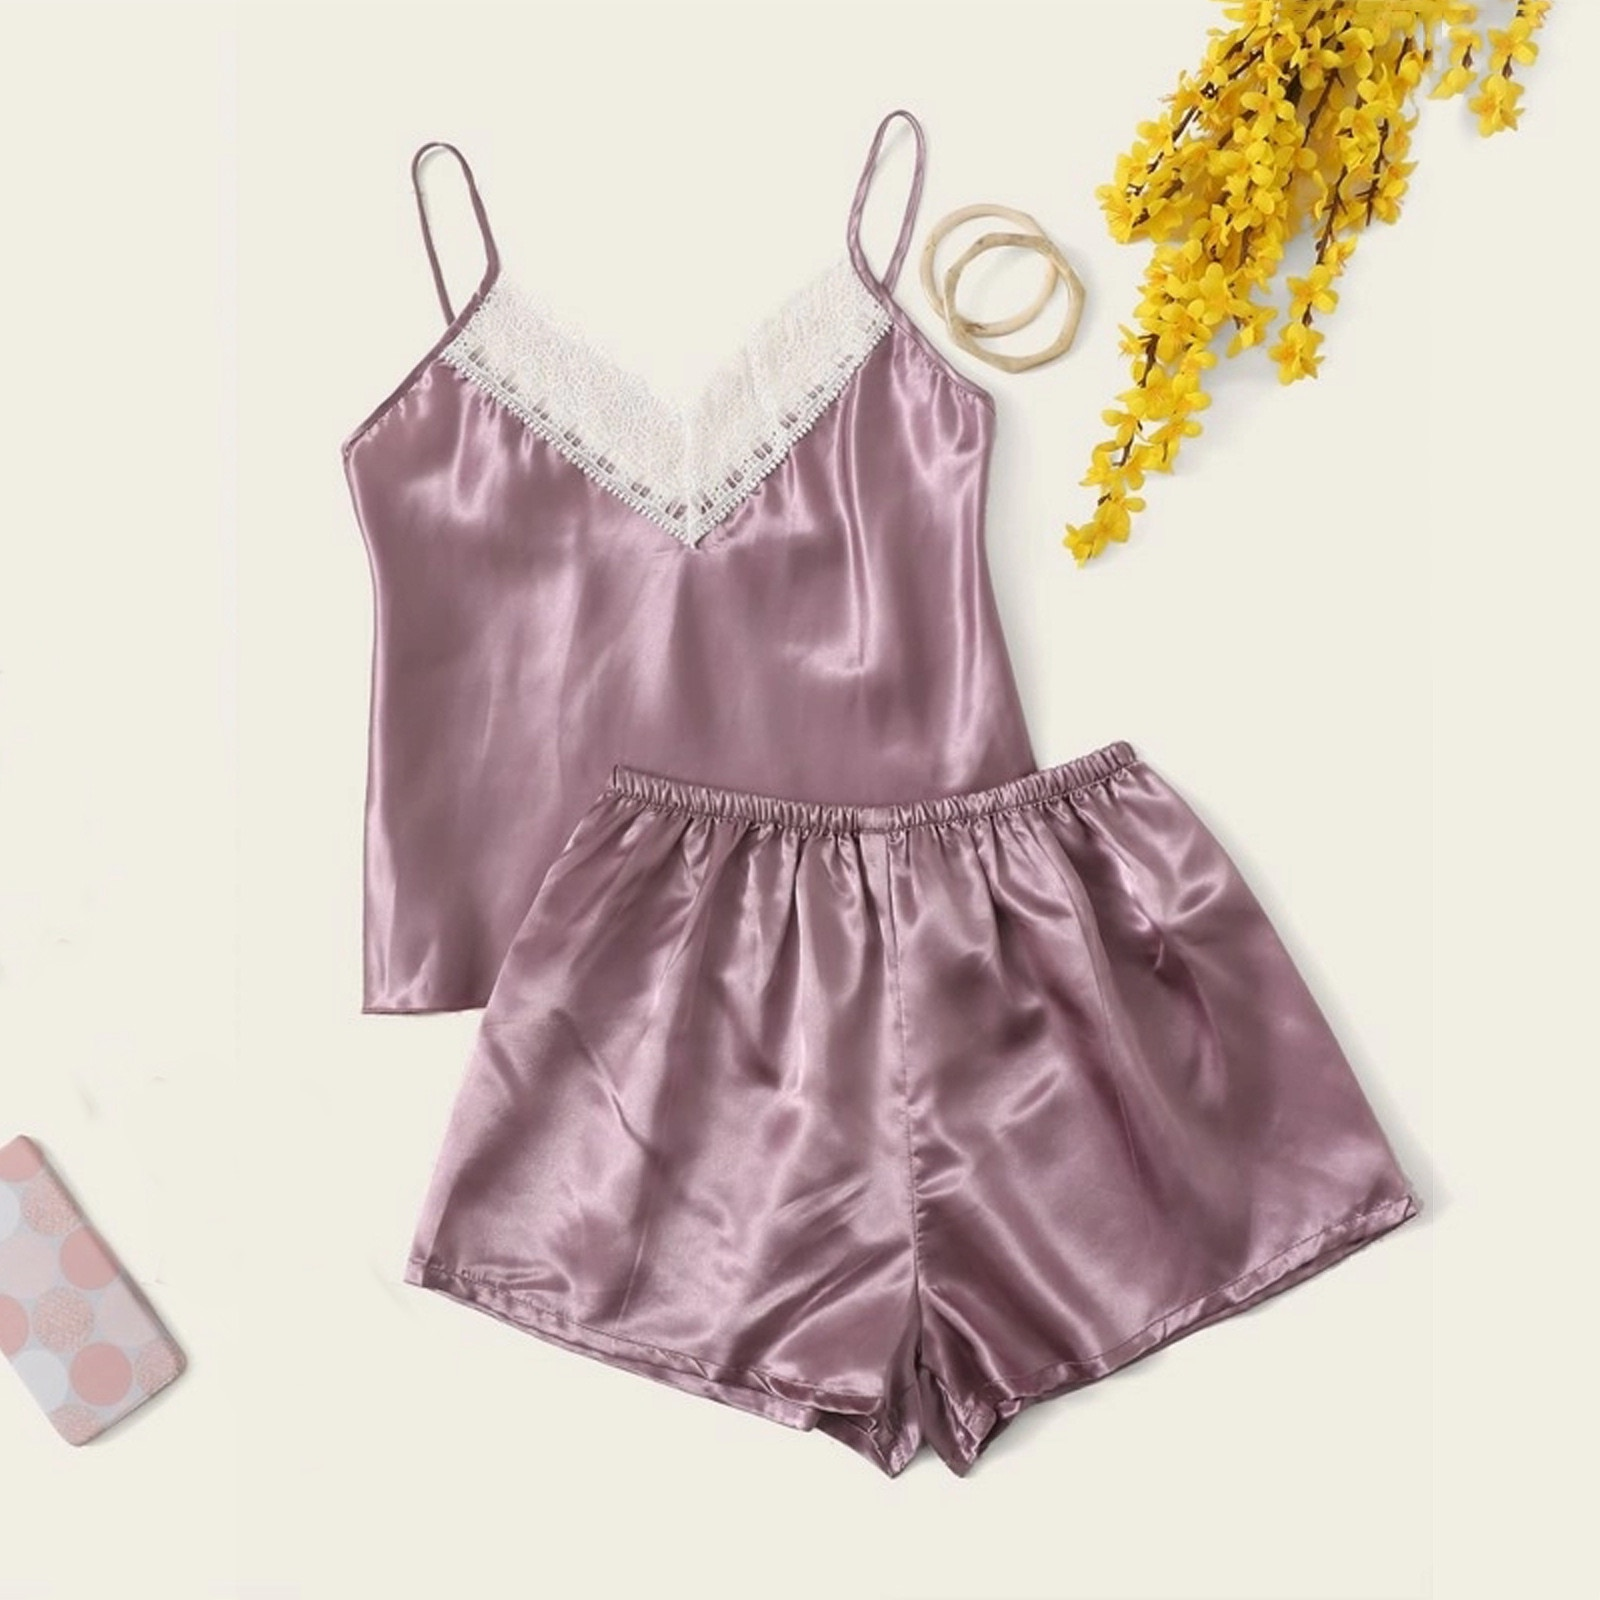 Satin Silk Solid Pajamas Women Sexy Lace Lingerie Sleepwear Cami Shorts Set Nightwear New Casual Paj